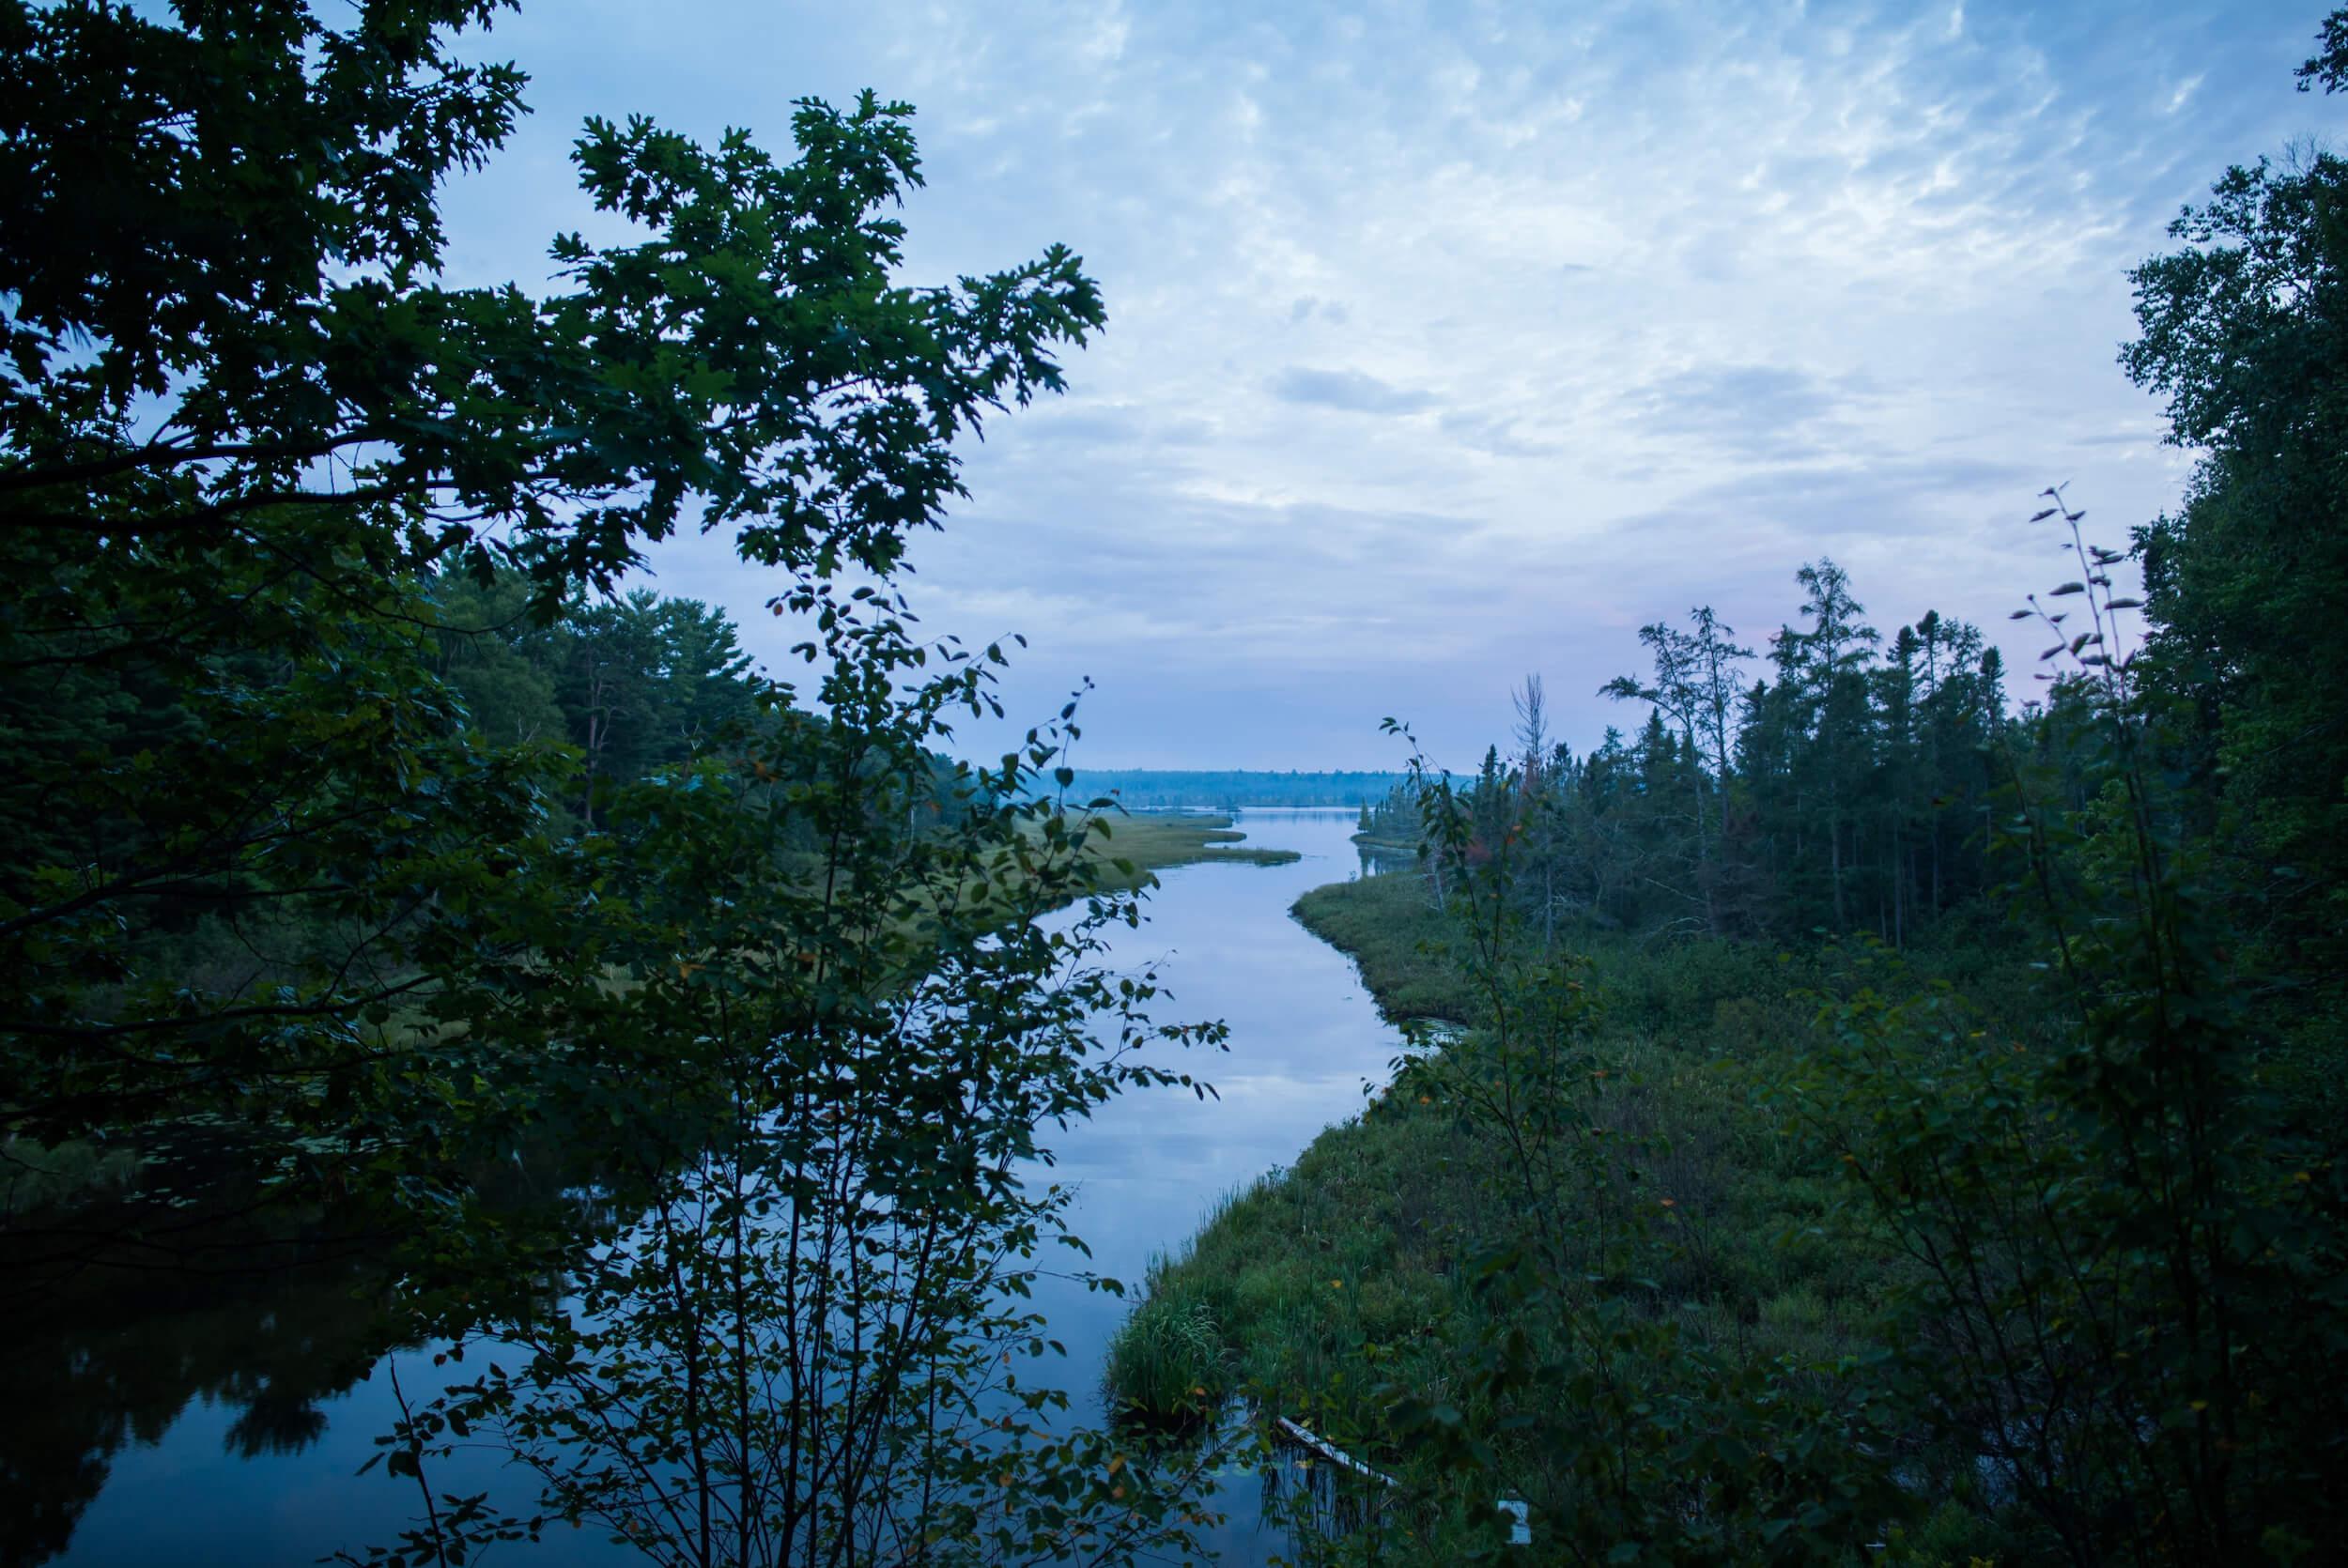 engle-olson-photography-madeline-island-4.jpg